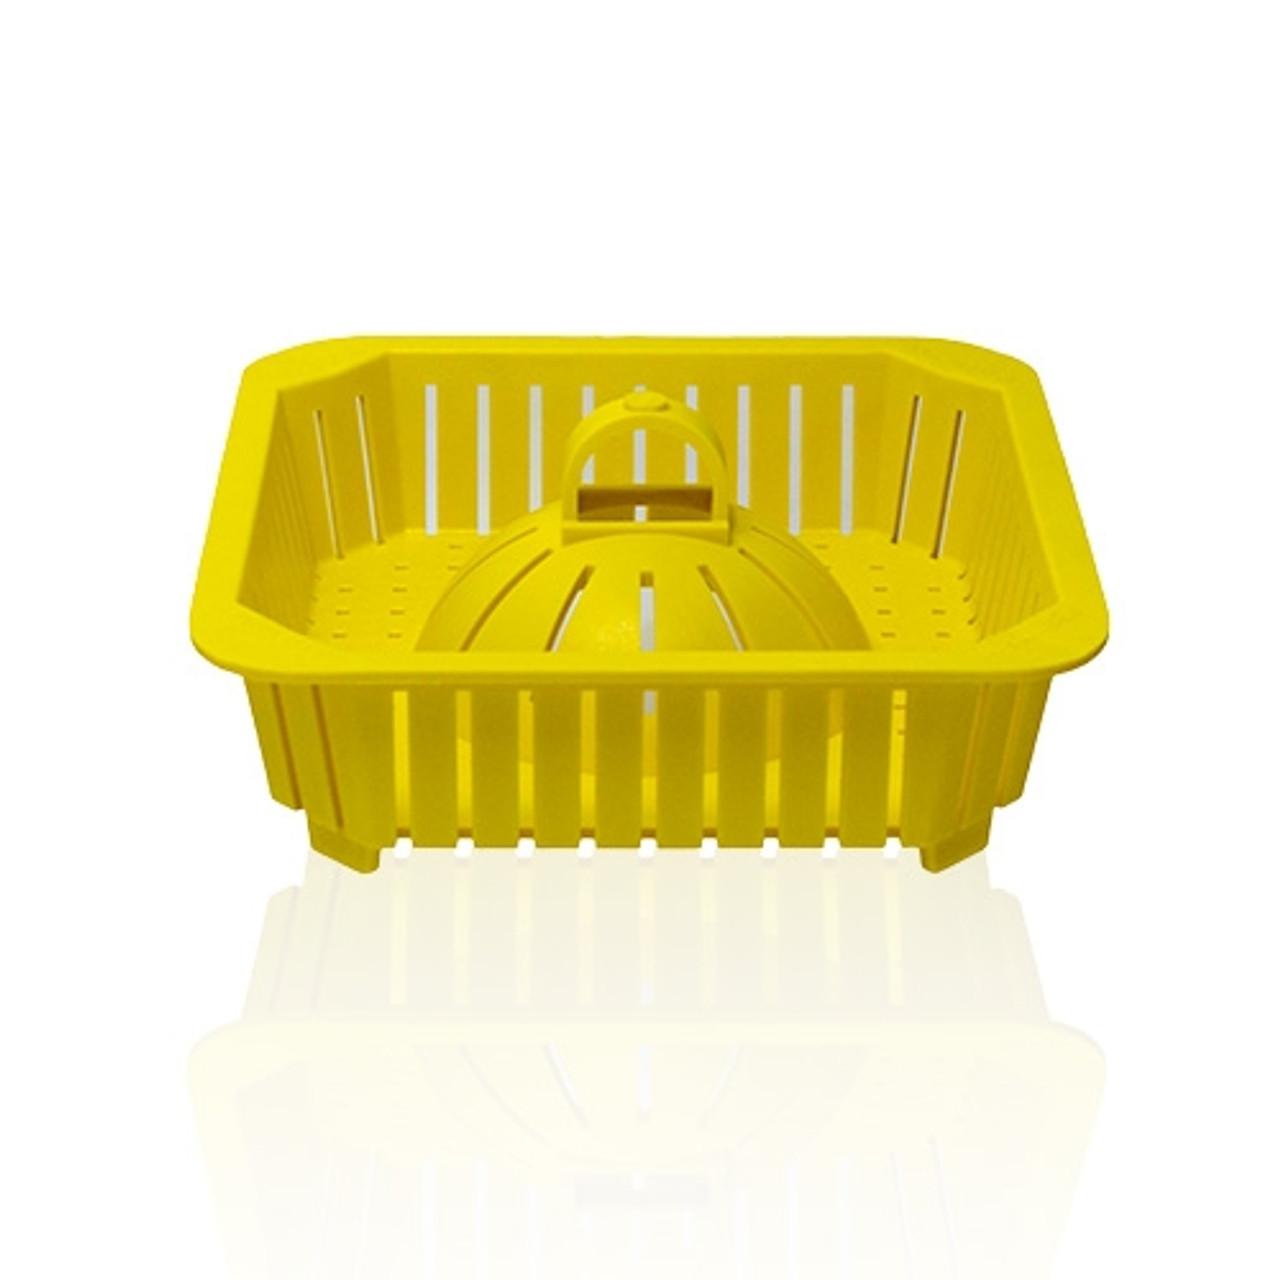 Domed Floor Sink Basket - 10.5 inch